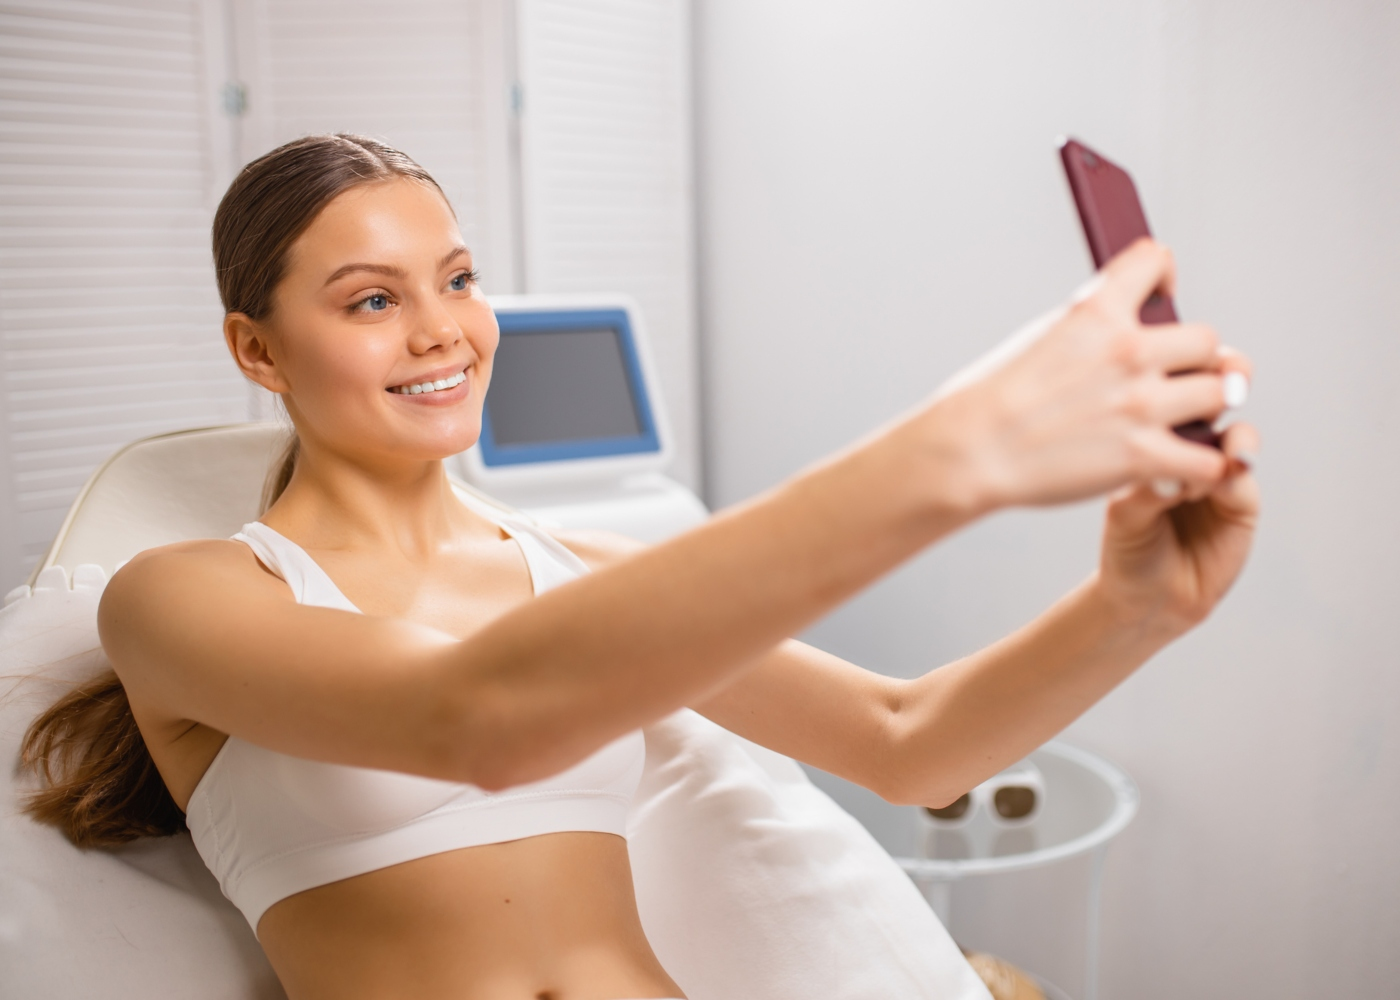 Mulher a tirar selfies após cirurgia estética